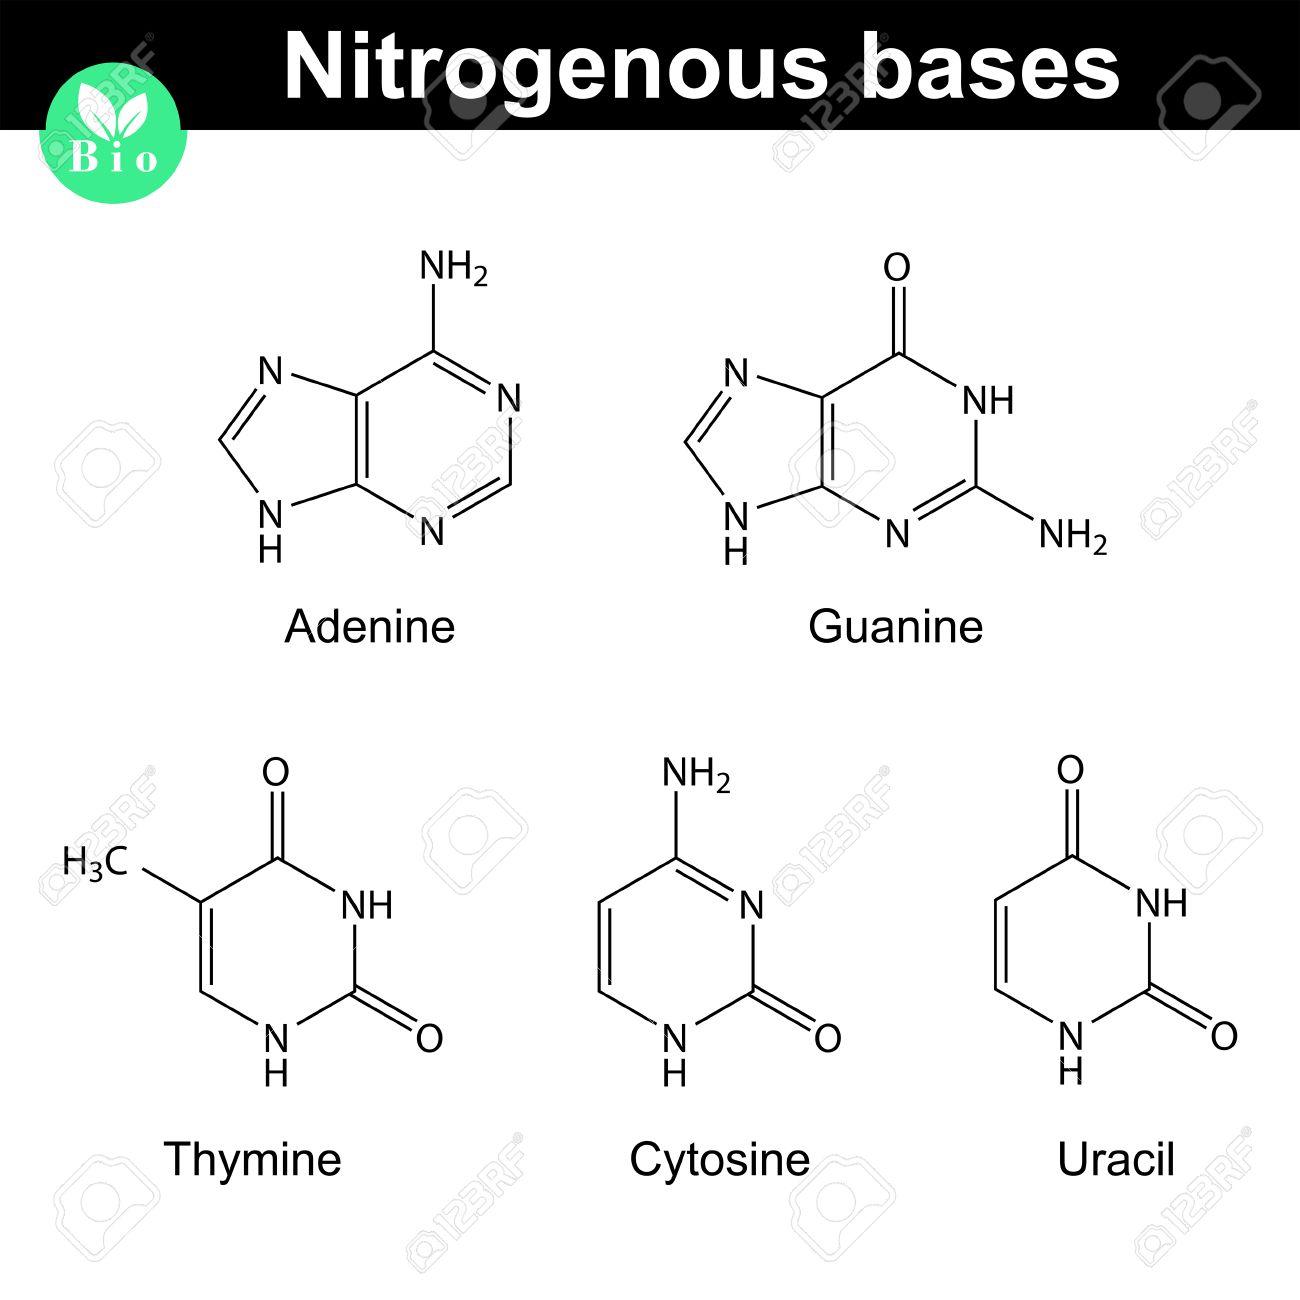 nitrogenous bases molecular structures, adenine, thymine, guanine, cytosine  and uracil molecules -